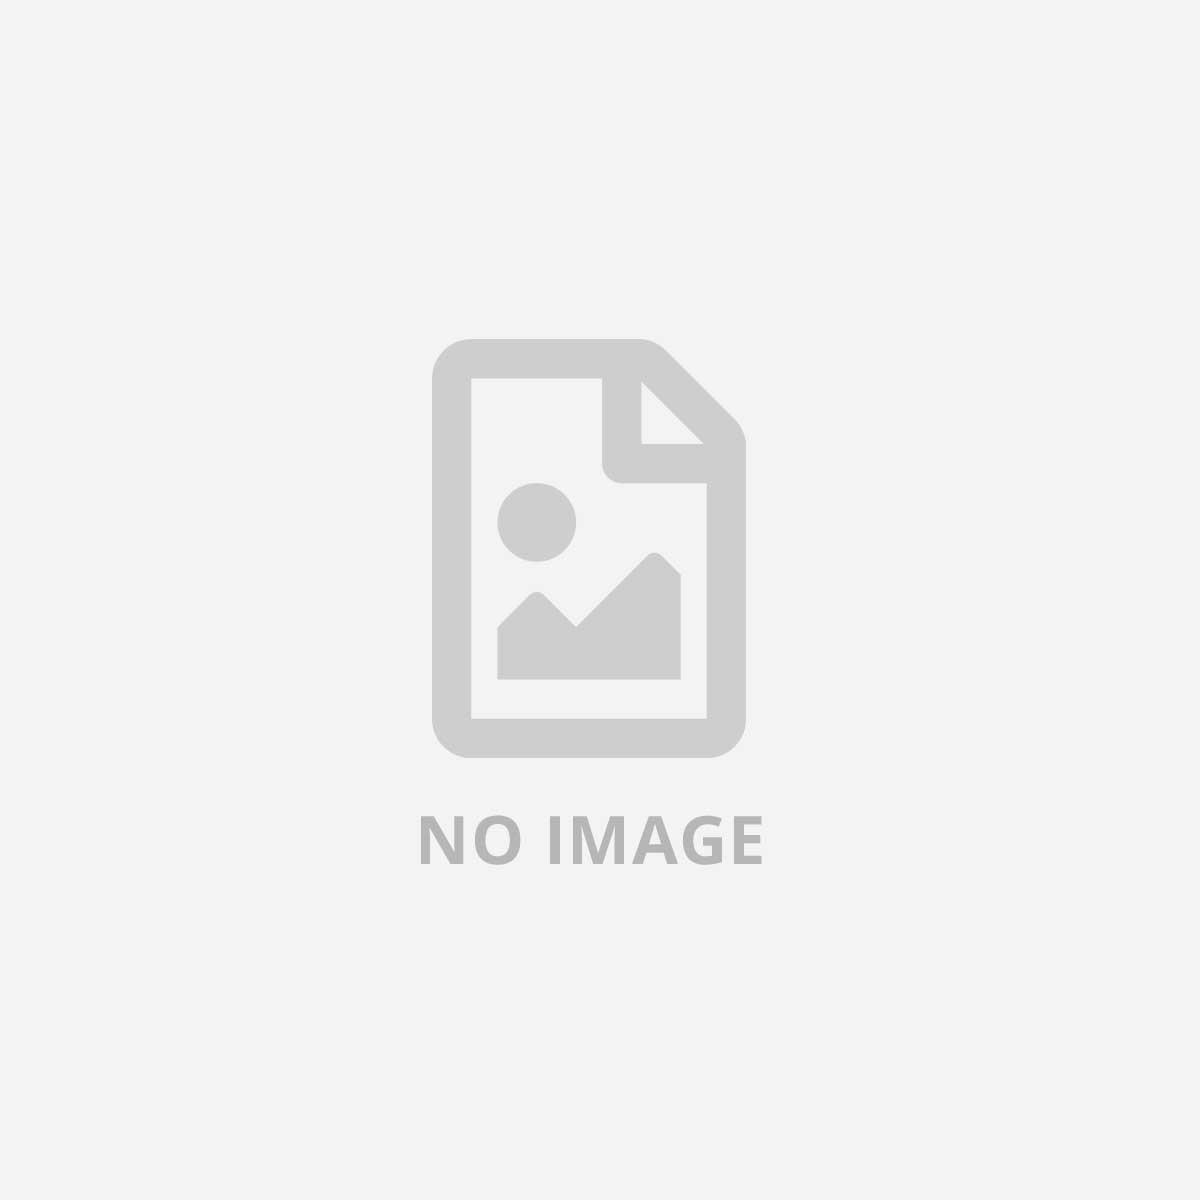 NILOX SFF-PC I3-5005U RAM 4GB 240GB FD